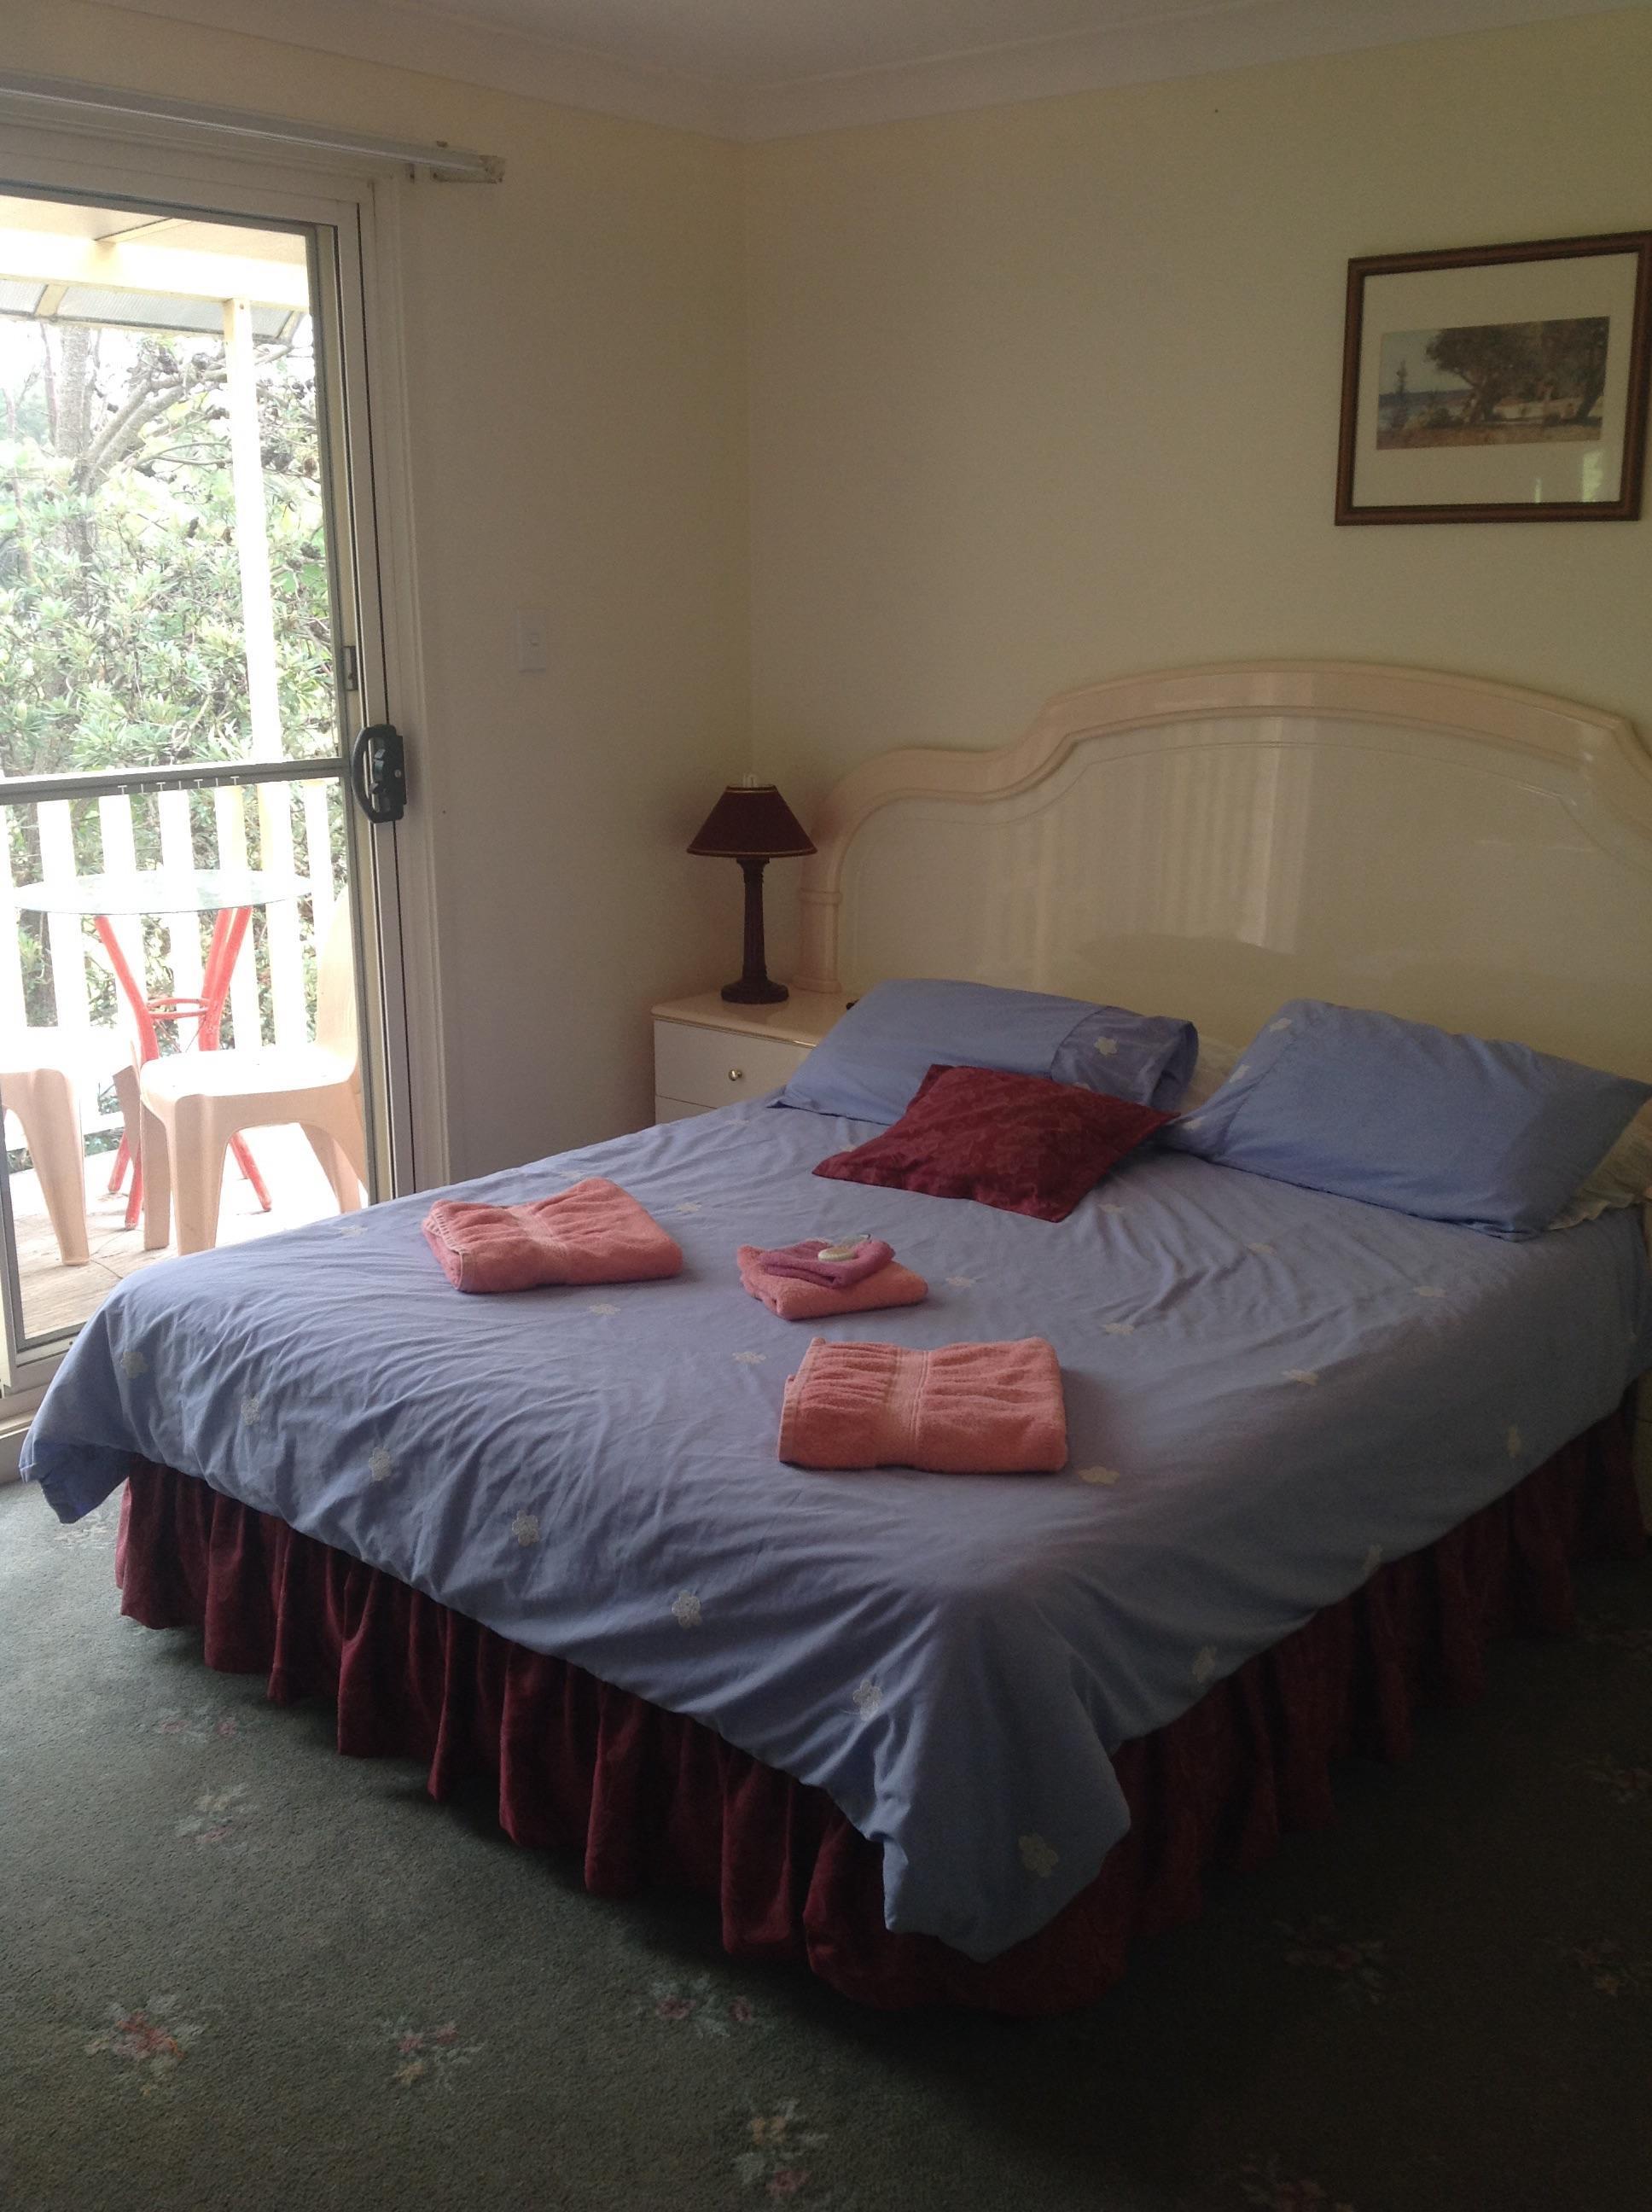 Lake Illawarra Bed and Breakfast